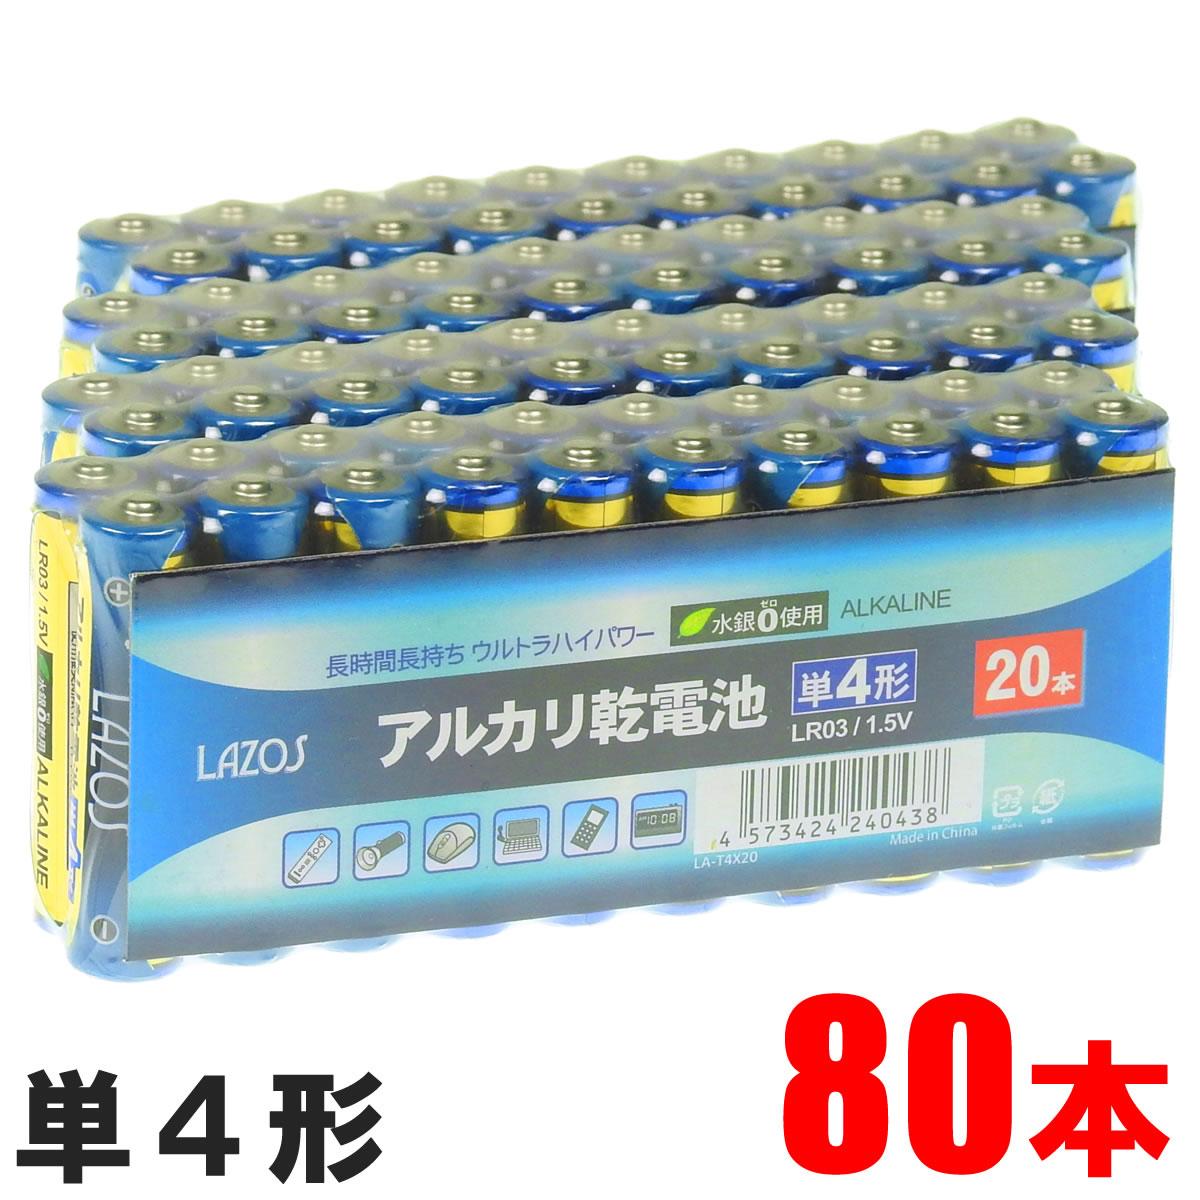 LAZOS 単4形 アルカリ乾電池 80本セット 長時間長持ち 返品送料無料 ウルトラハイパワー ALKALINE 1.5V 水銀0 買い物 LR03